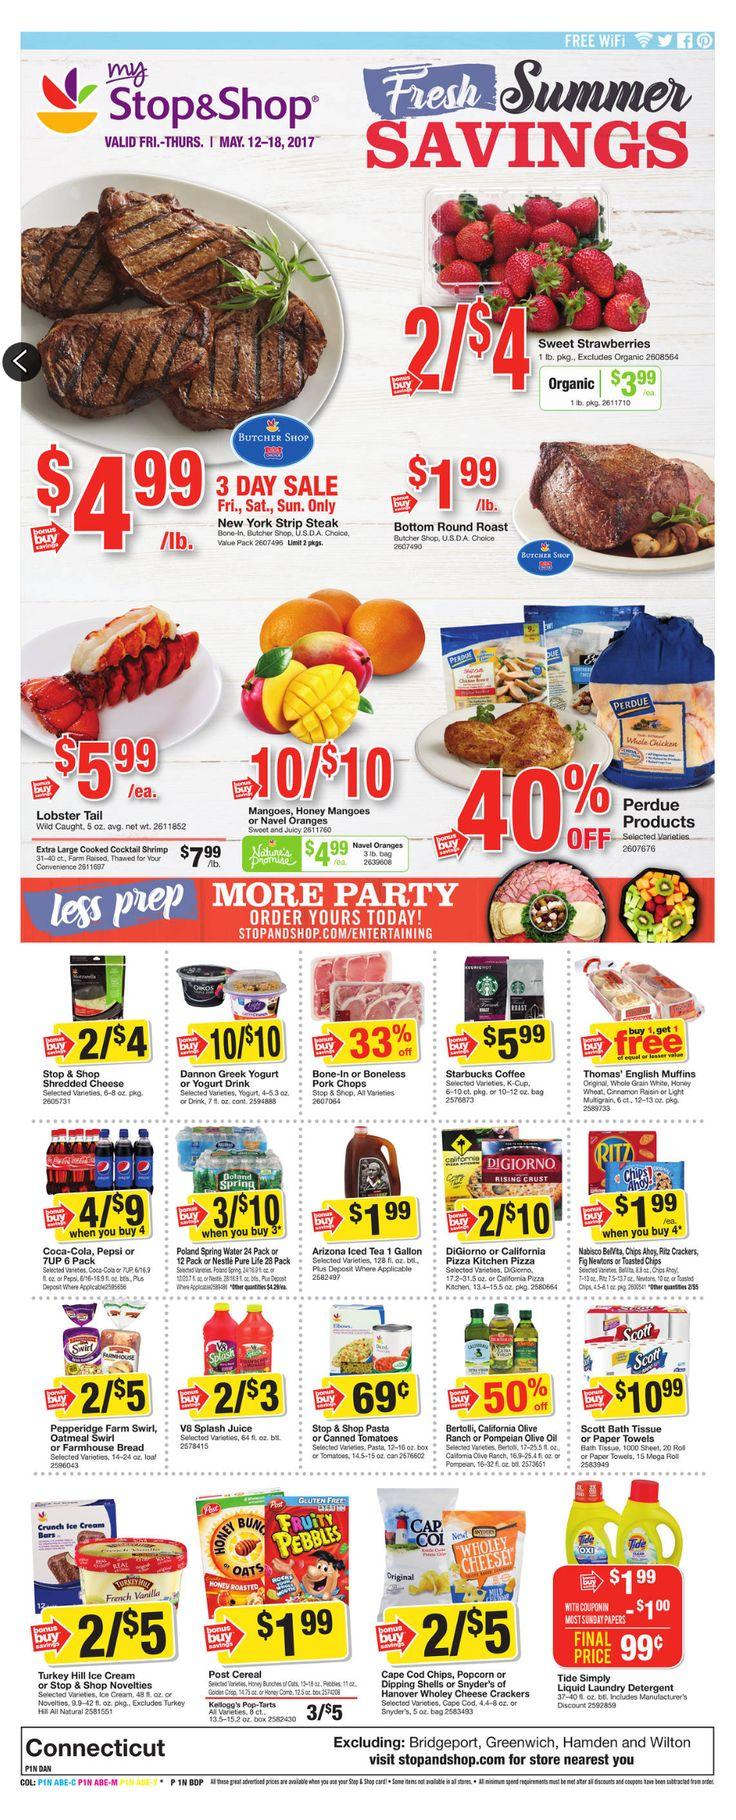 Stop and Shop Circular May 12 - 18, 2017 - http://www.olcatalog.com/grocery/stop-and-shop-circular.html